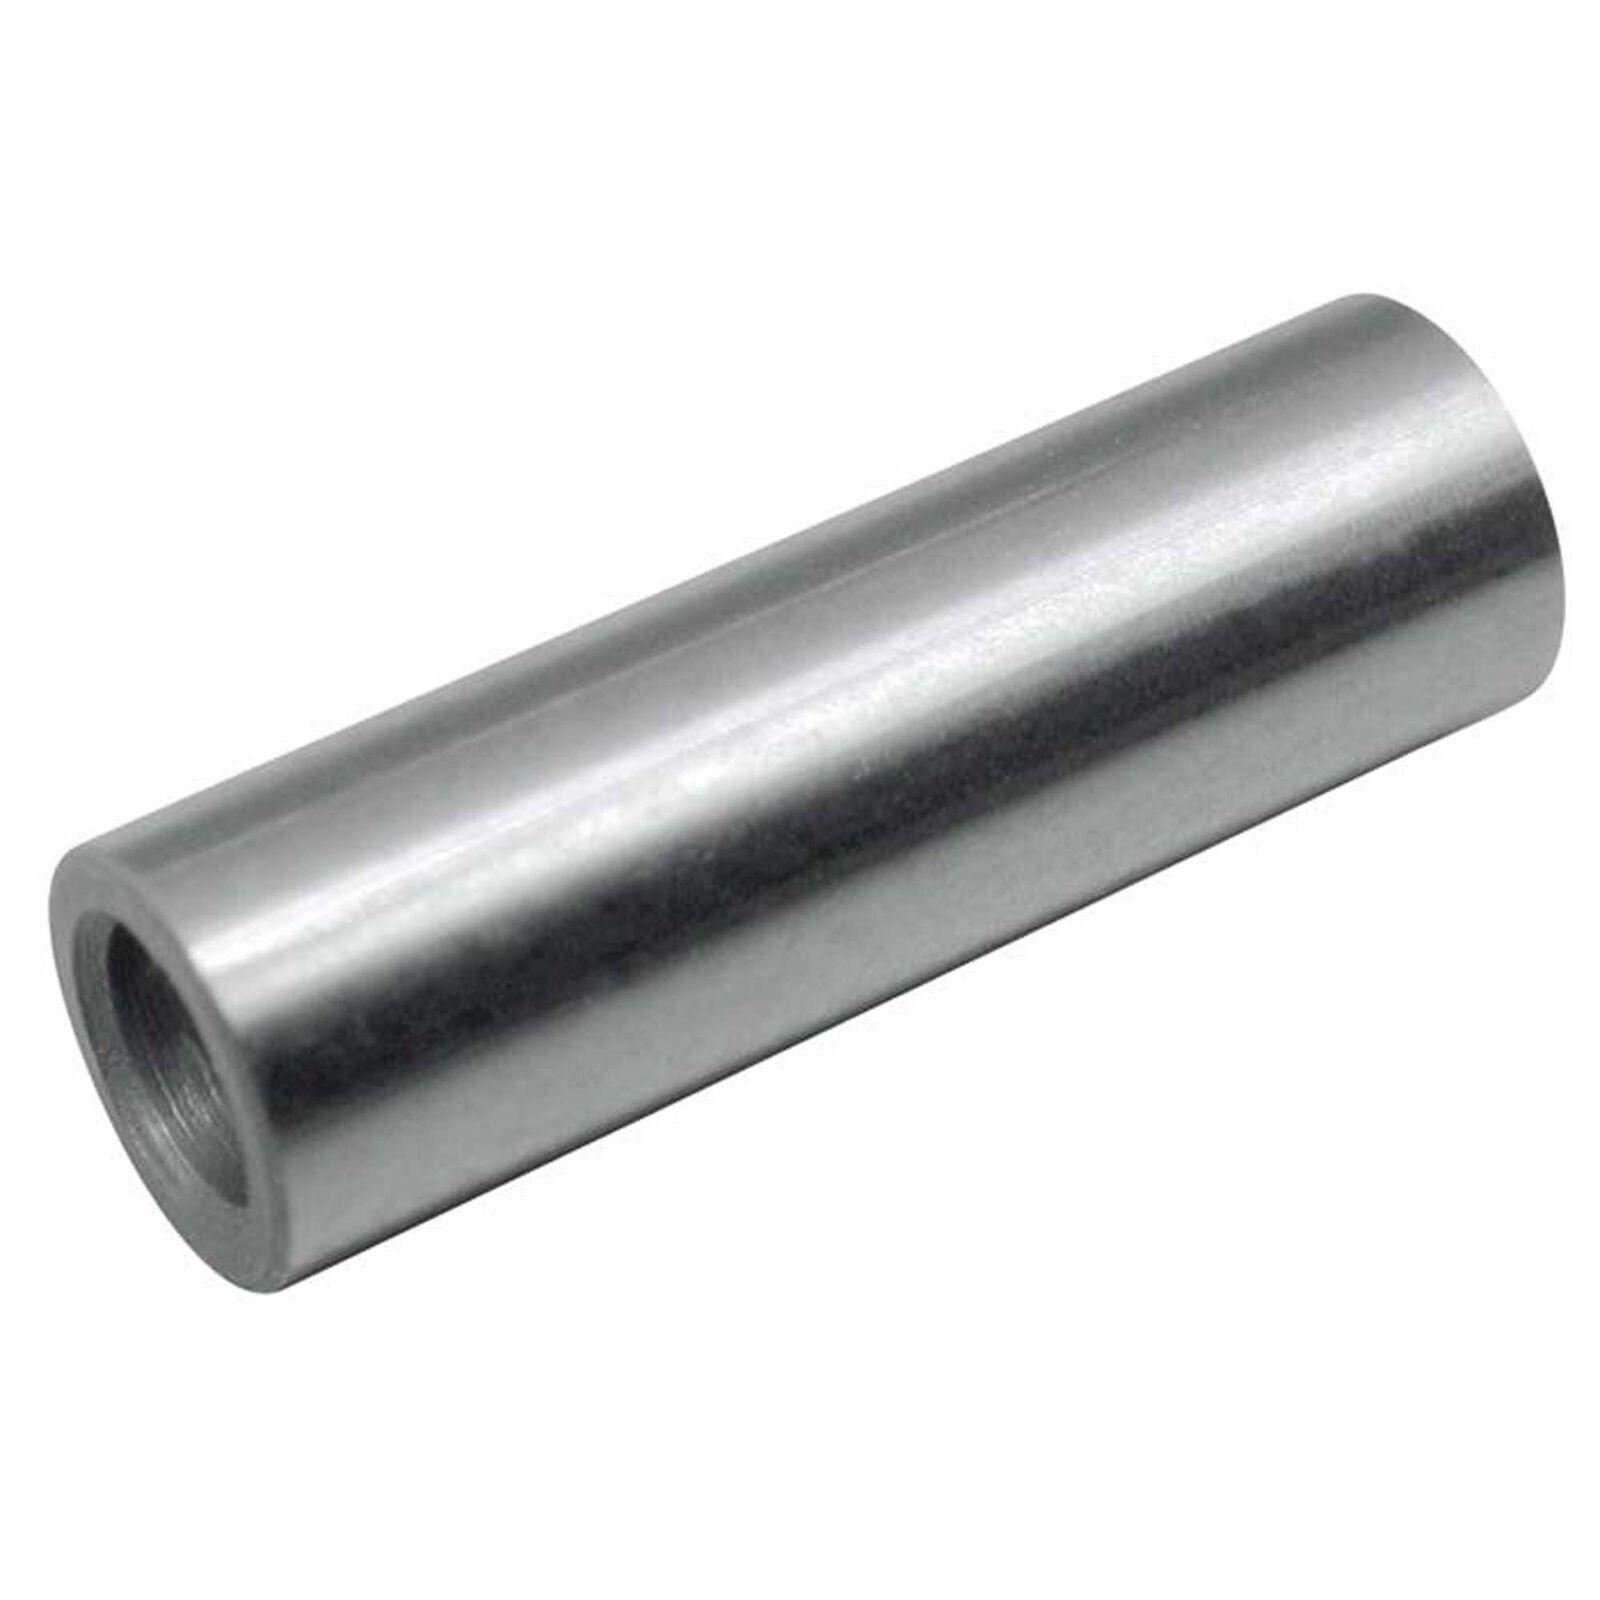 Piston Pin: 15RX